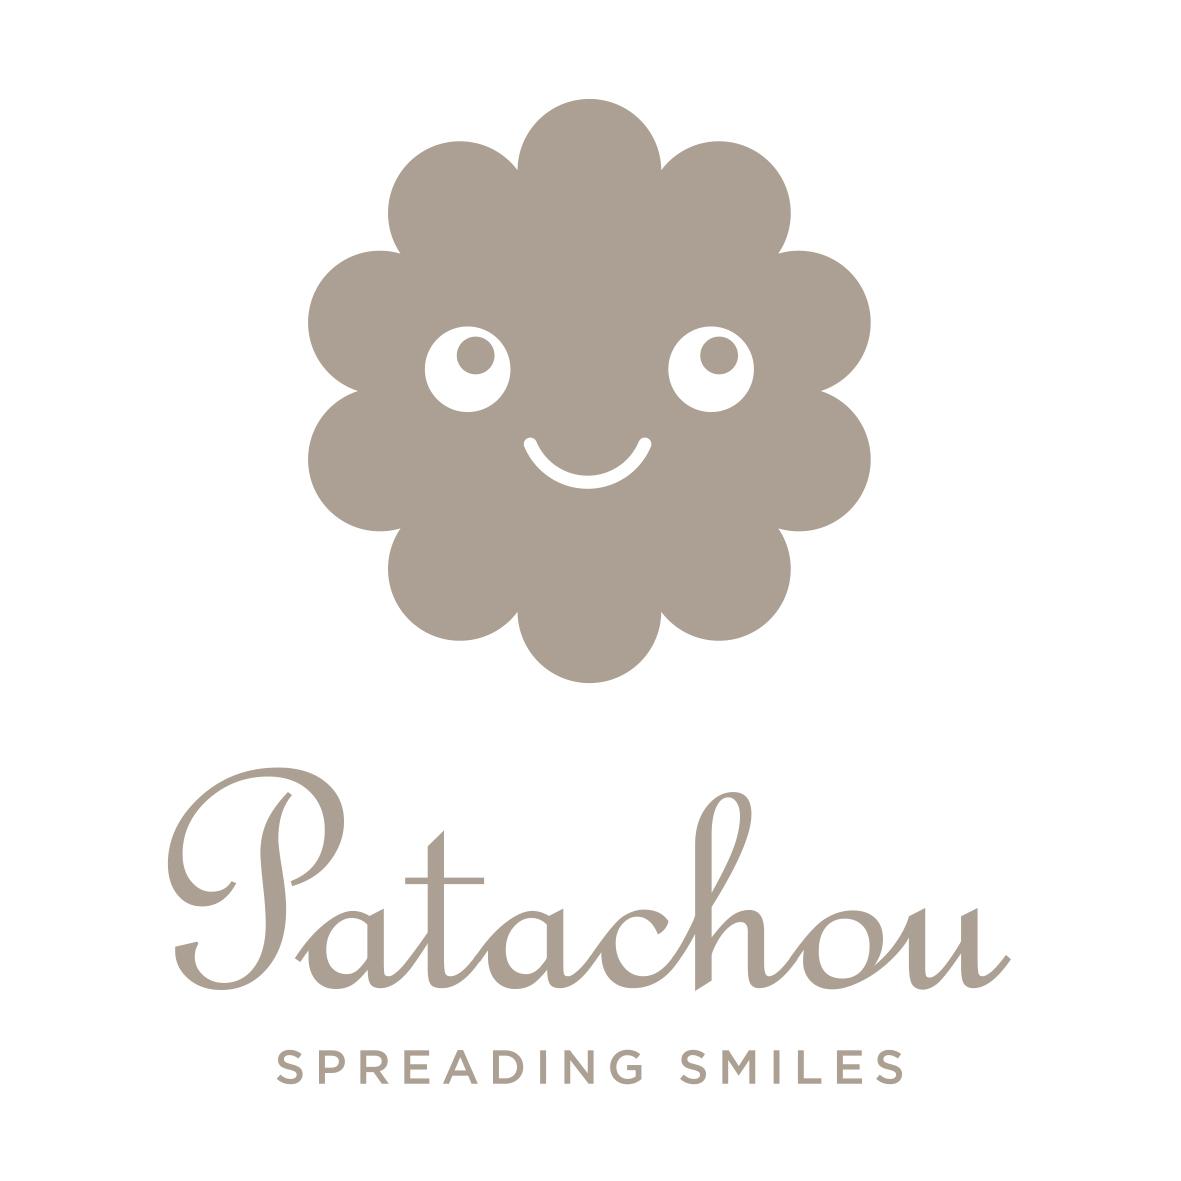 patachou_1